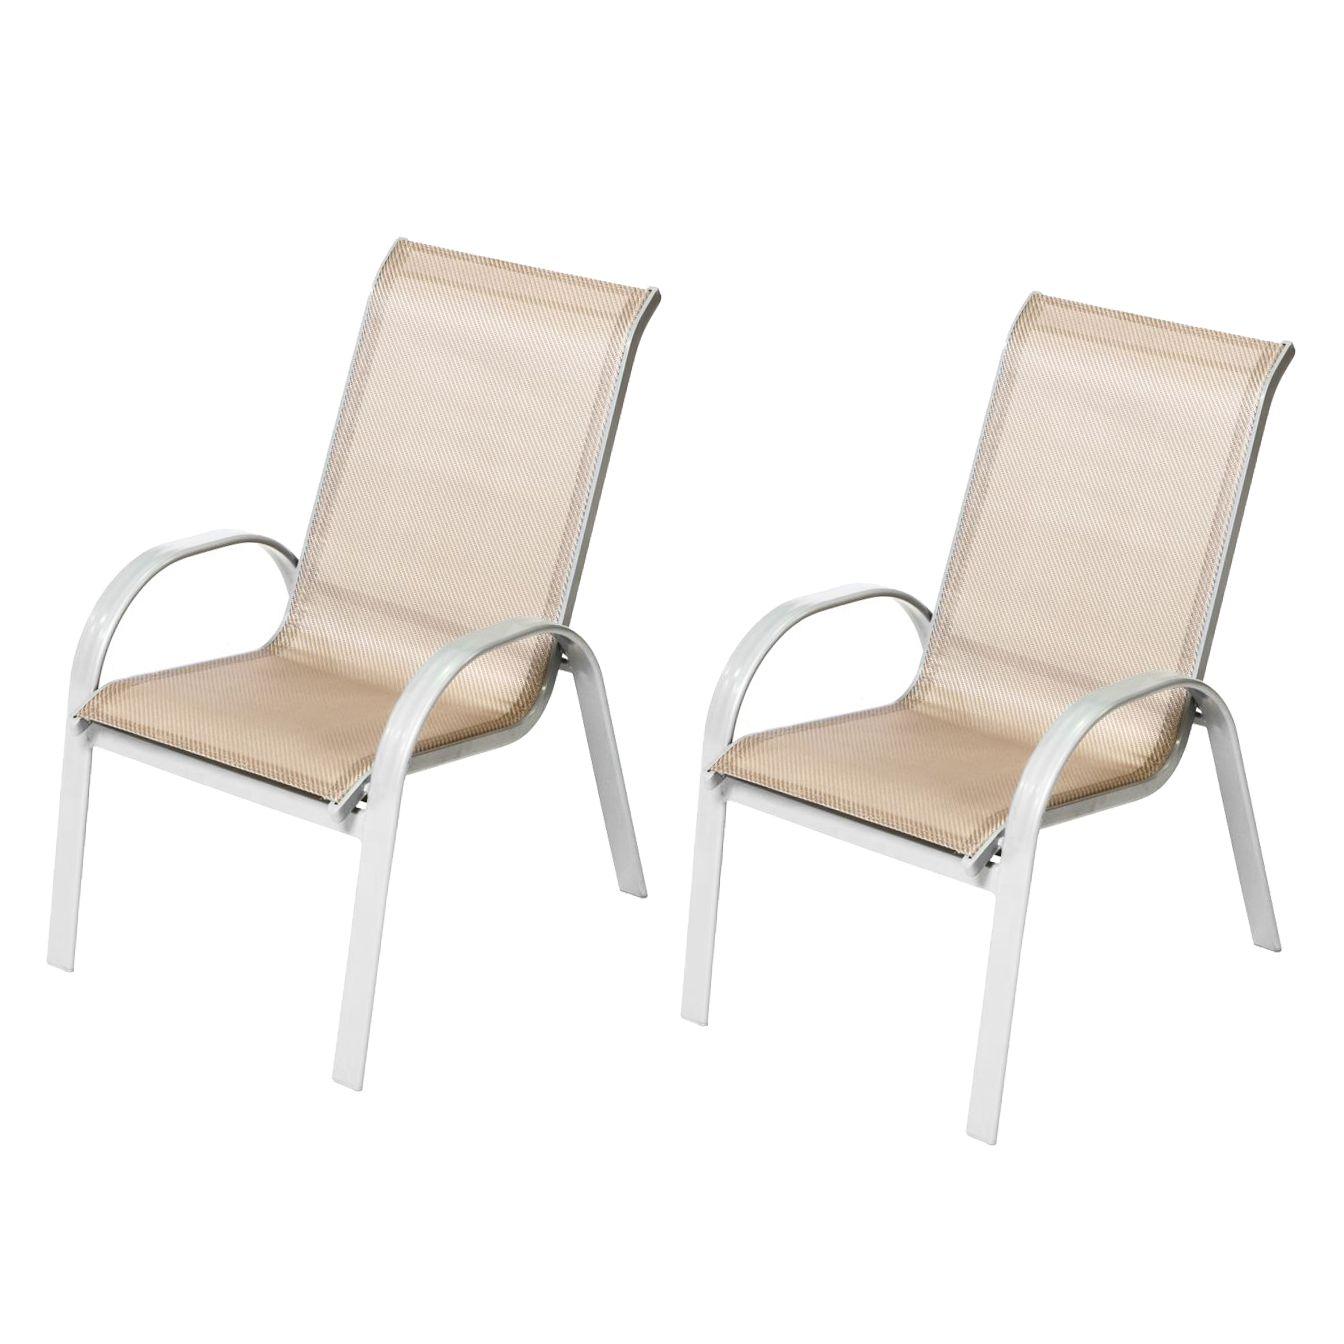 stapelsessel amalfi i 2er set aluminium textilene. Black Bedroom Furniture Sets. Home Design Ideas